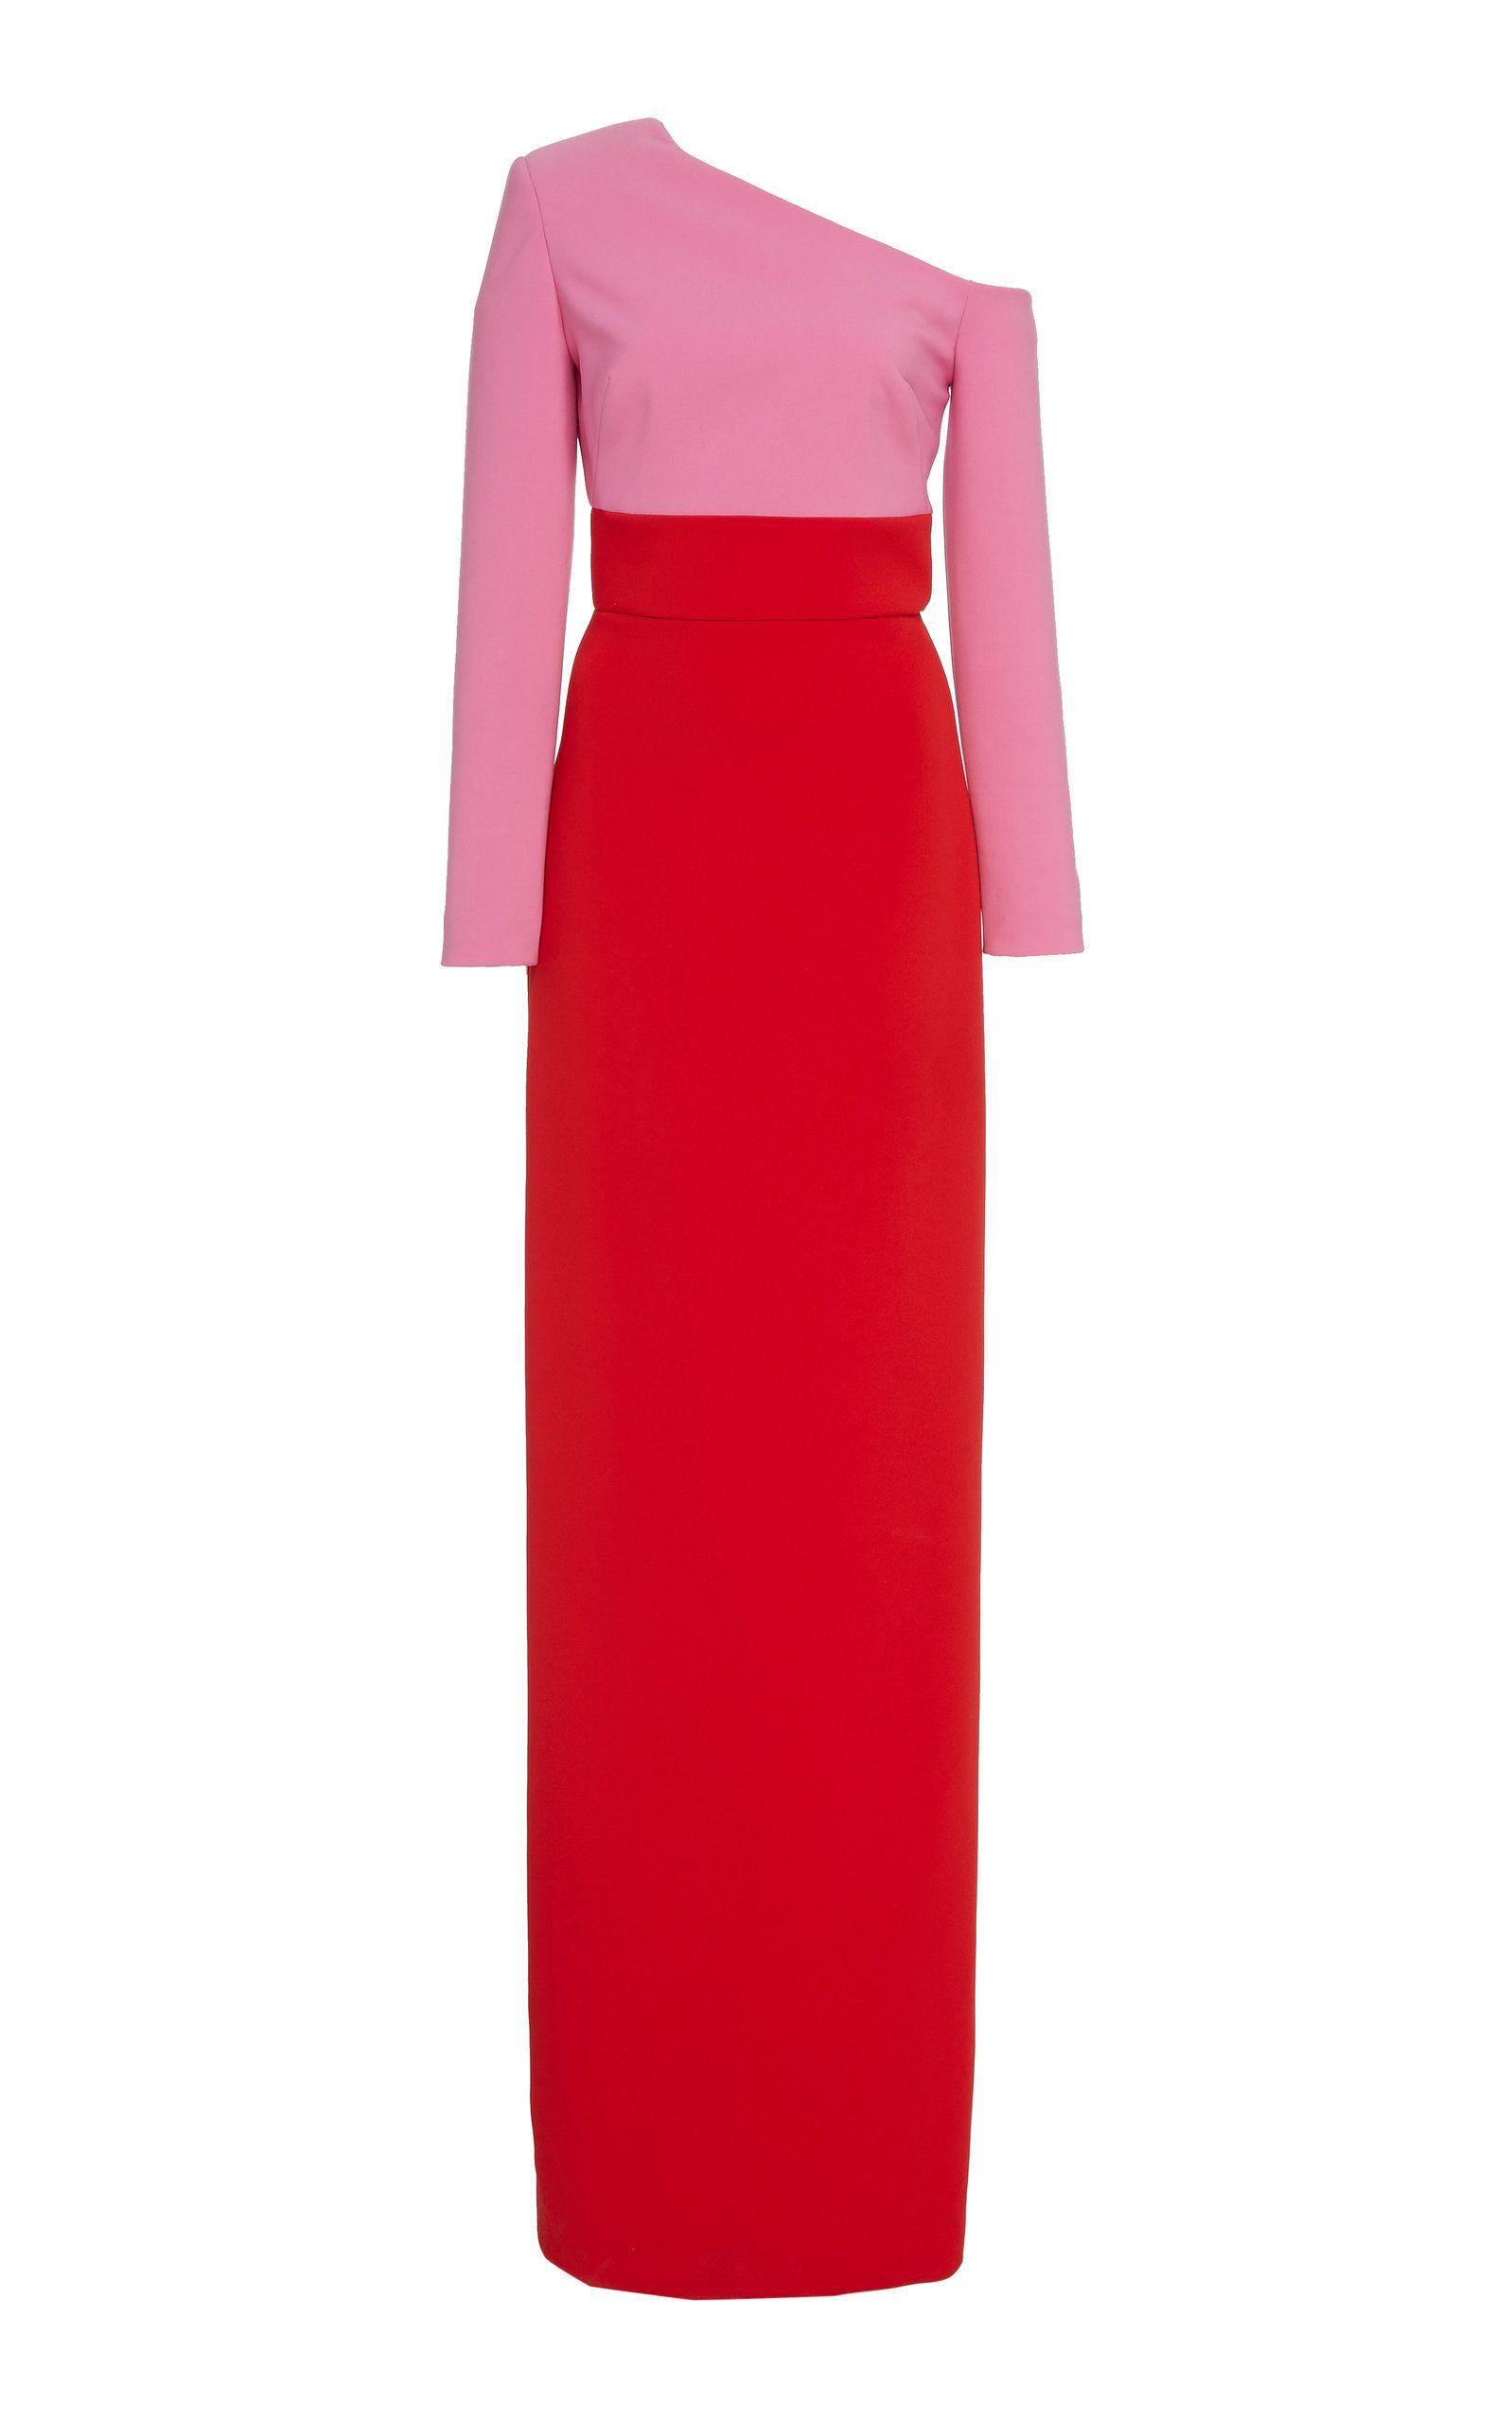 3f0b867ec23 Asymmetrical Two-Tone Jersey Gown by BRANDON MAXWELL for Preorder on Moda  Operandi